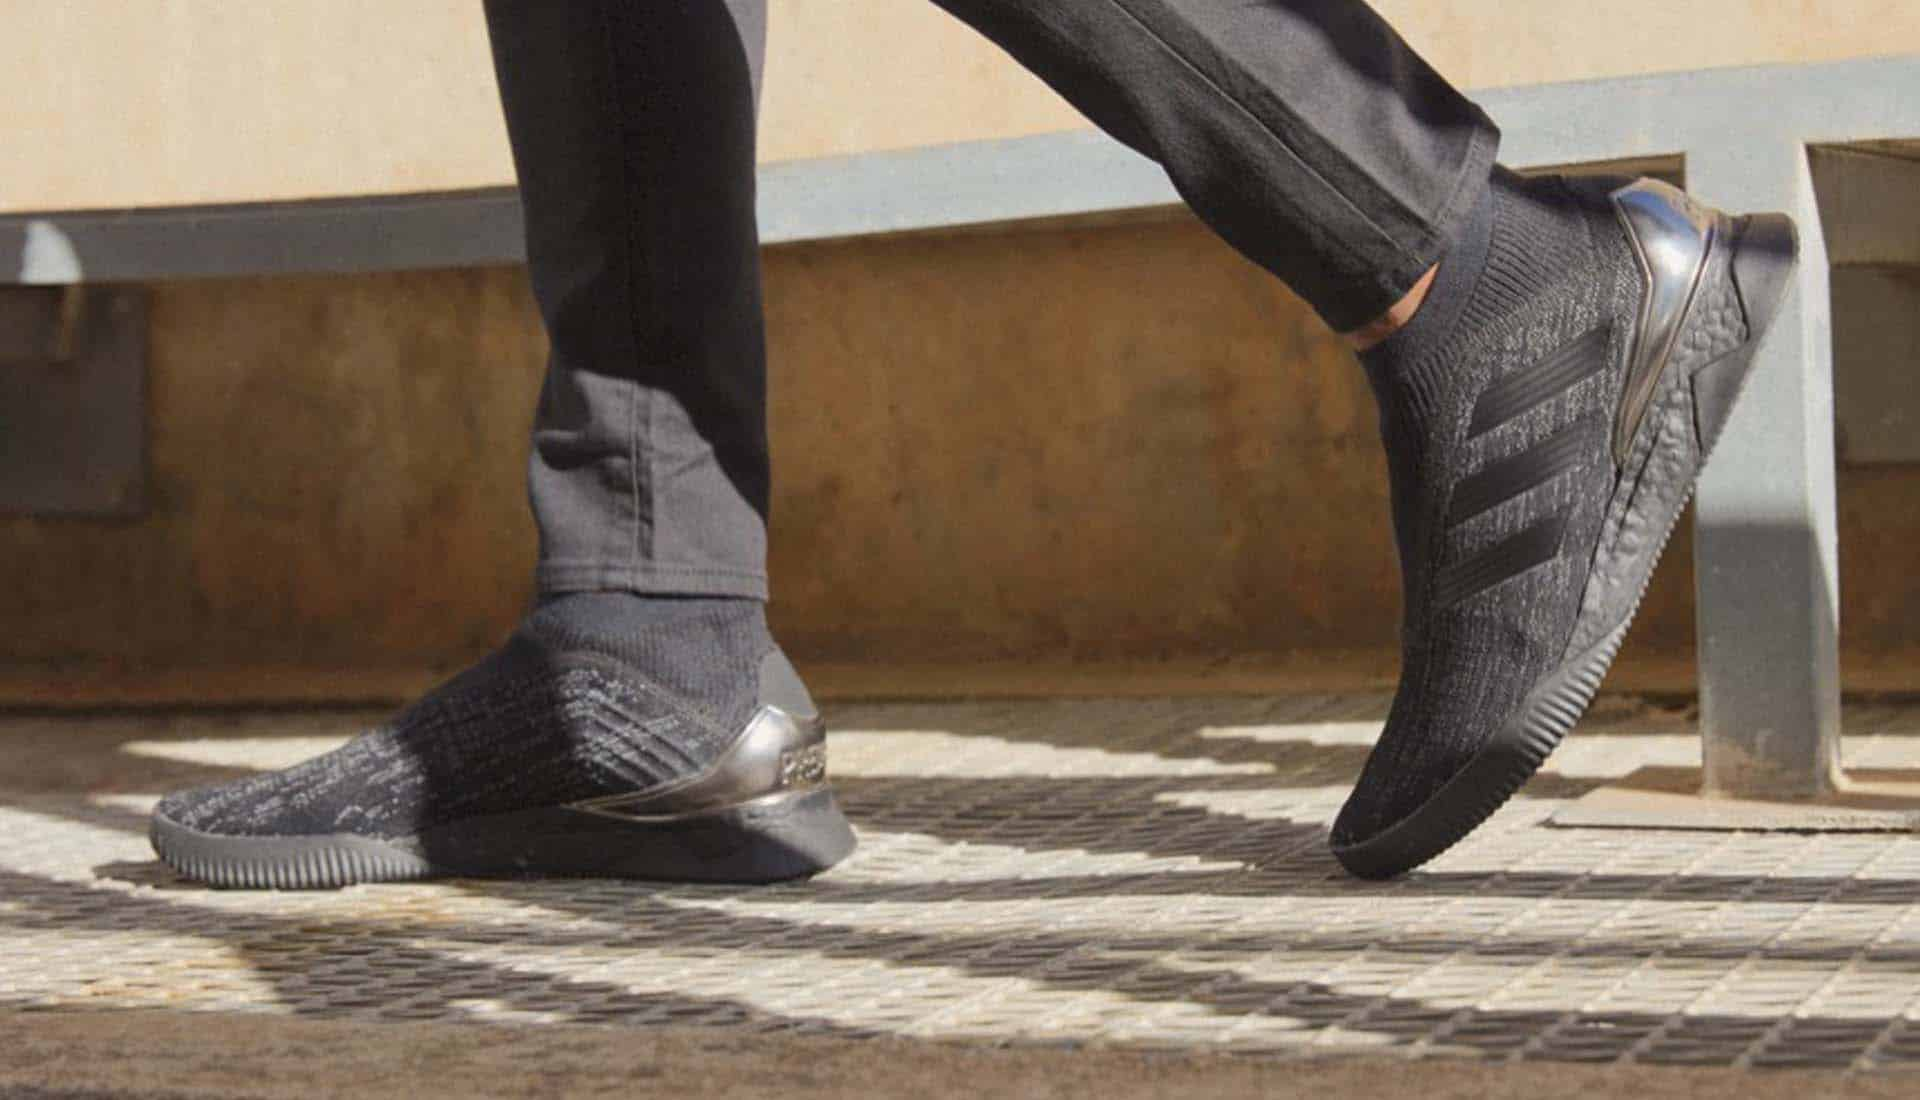 chaussures-lifestyle-adidas-Predator-Tango-18-Nite-Crawler-img2